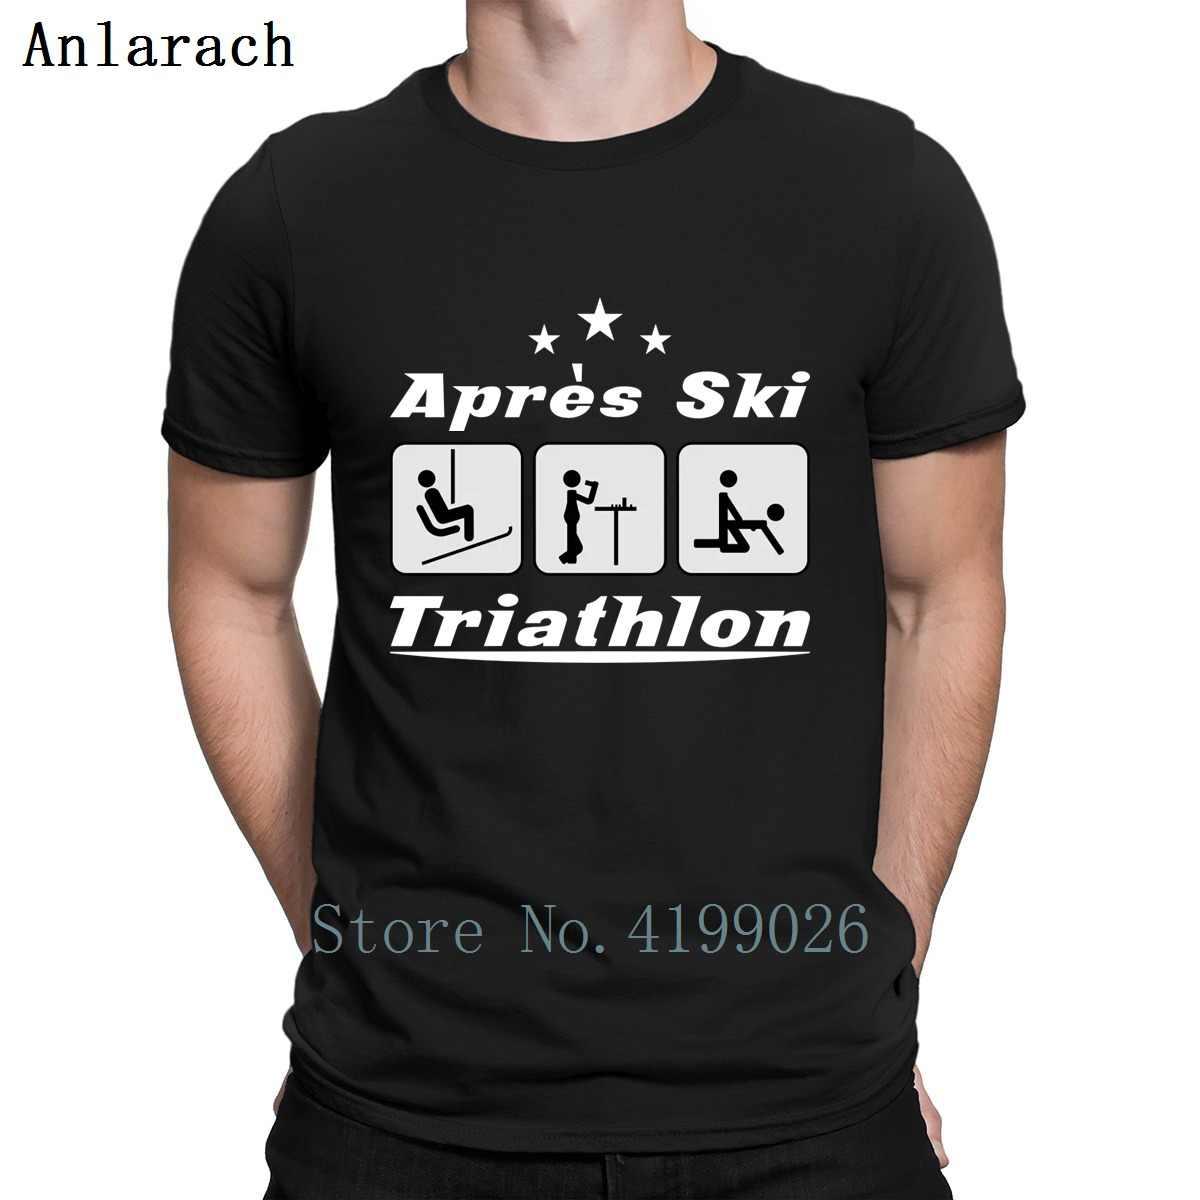 44055160 Apres Ski Triathlon Tshirt Funny Casual Personality Tee Top Humorous  Sunlight Tshirt For Men Standard Crew